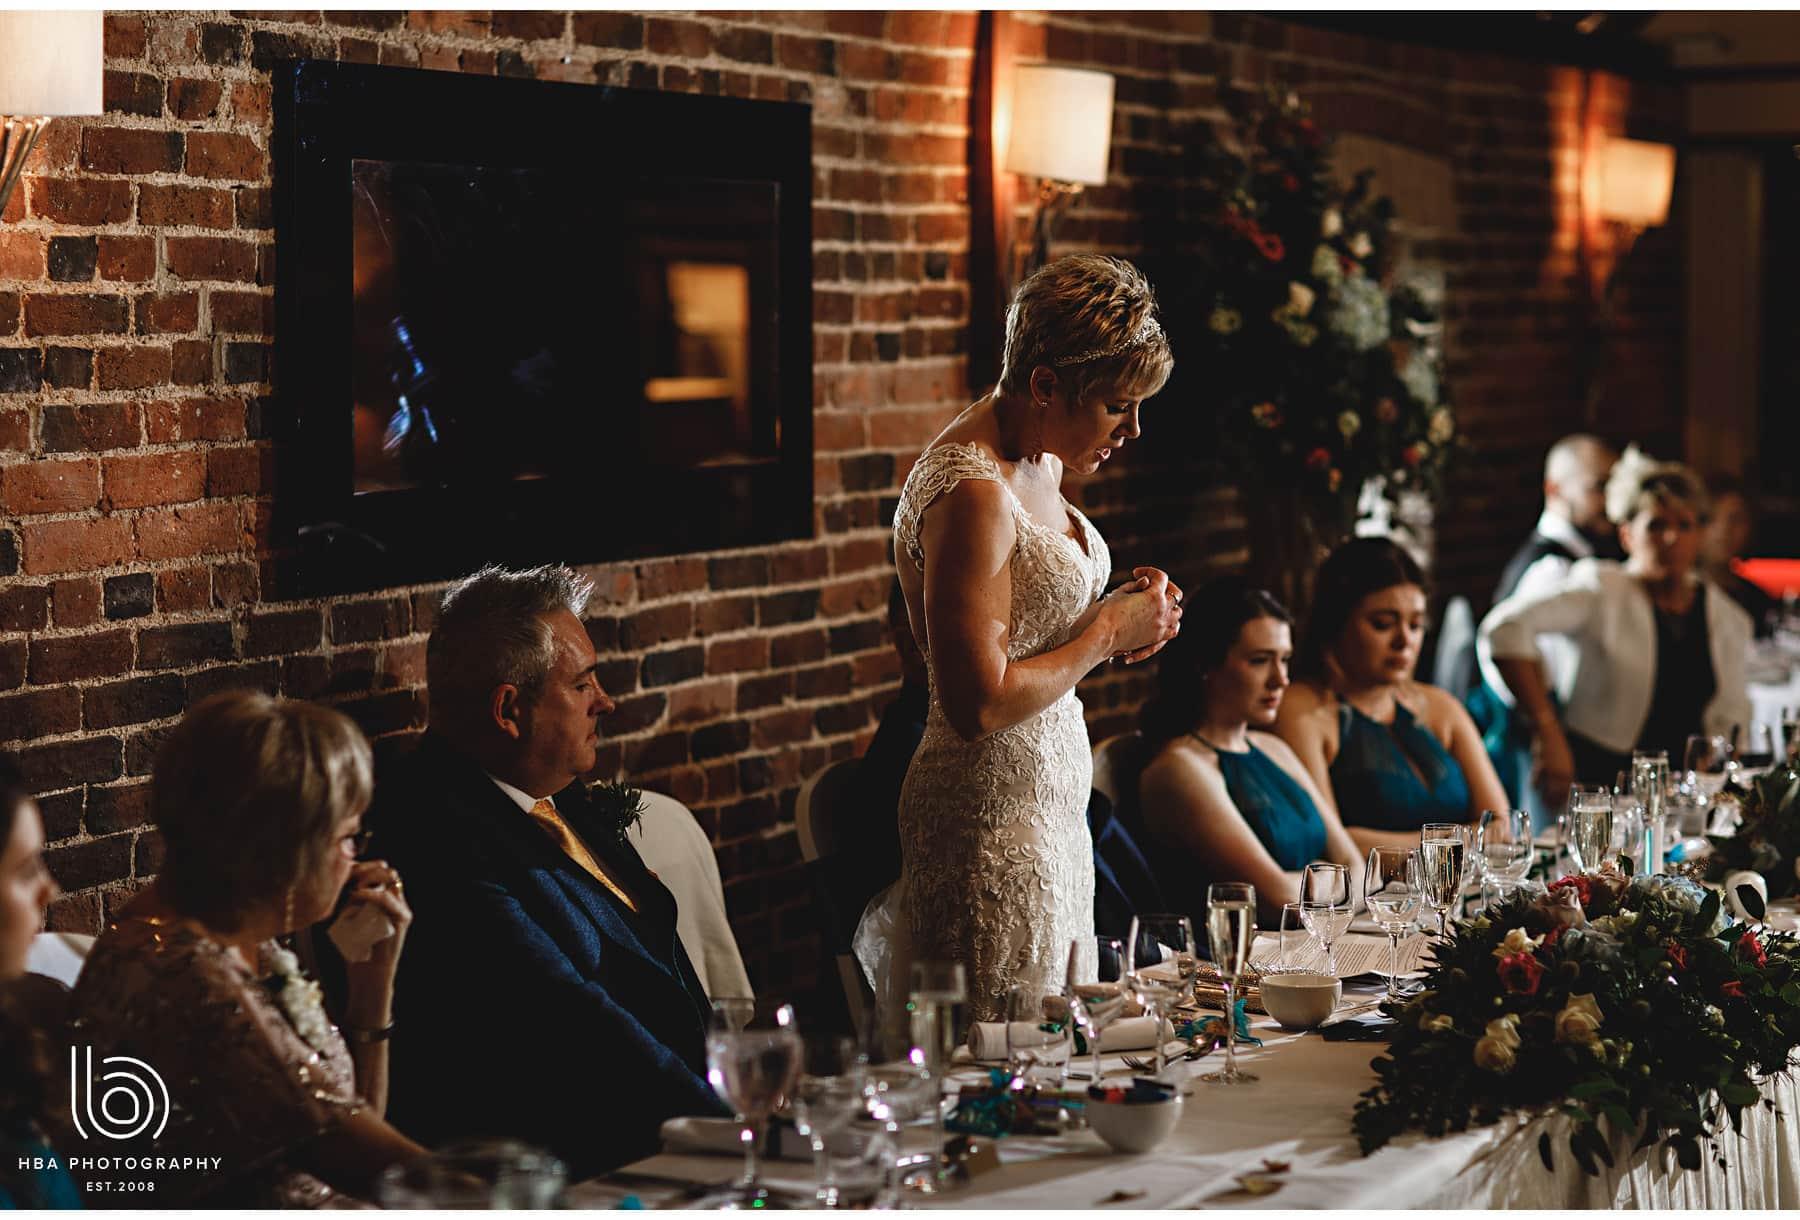 the bride making her speech